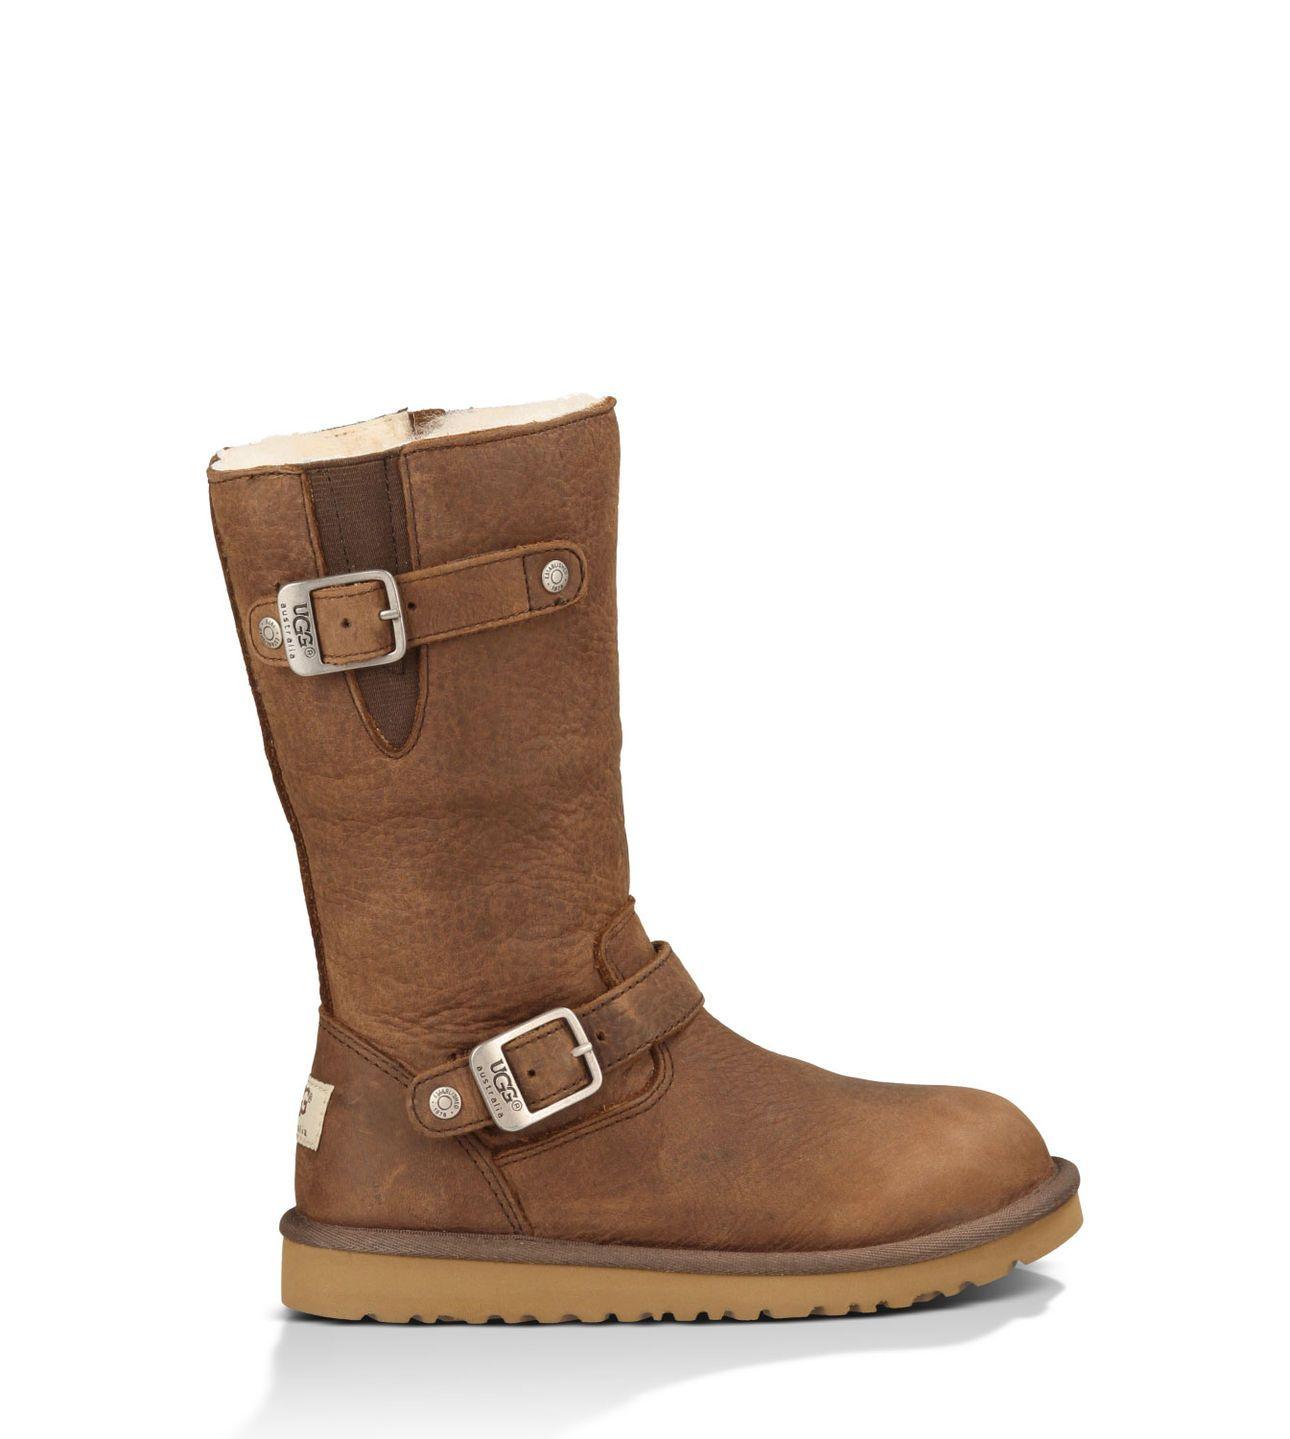 Kensington | Leather Buckle Boots